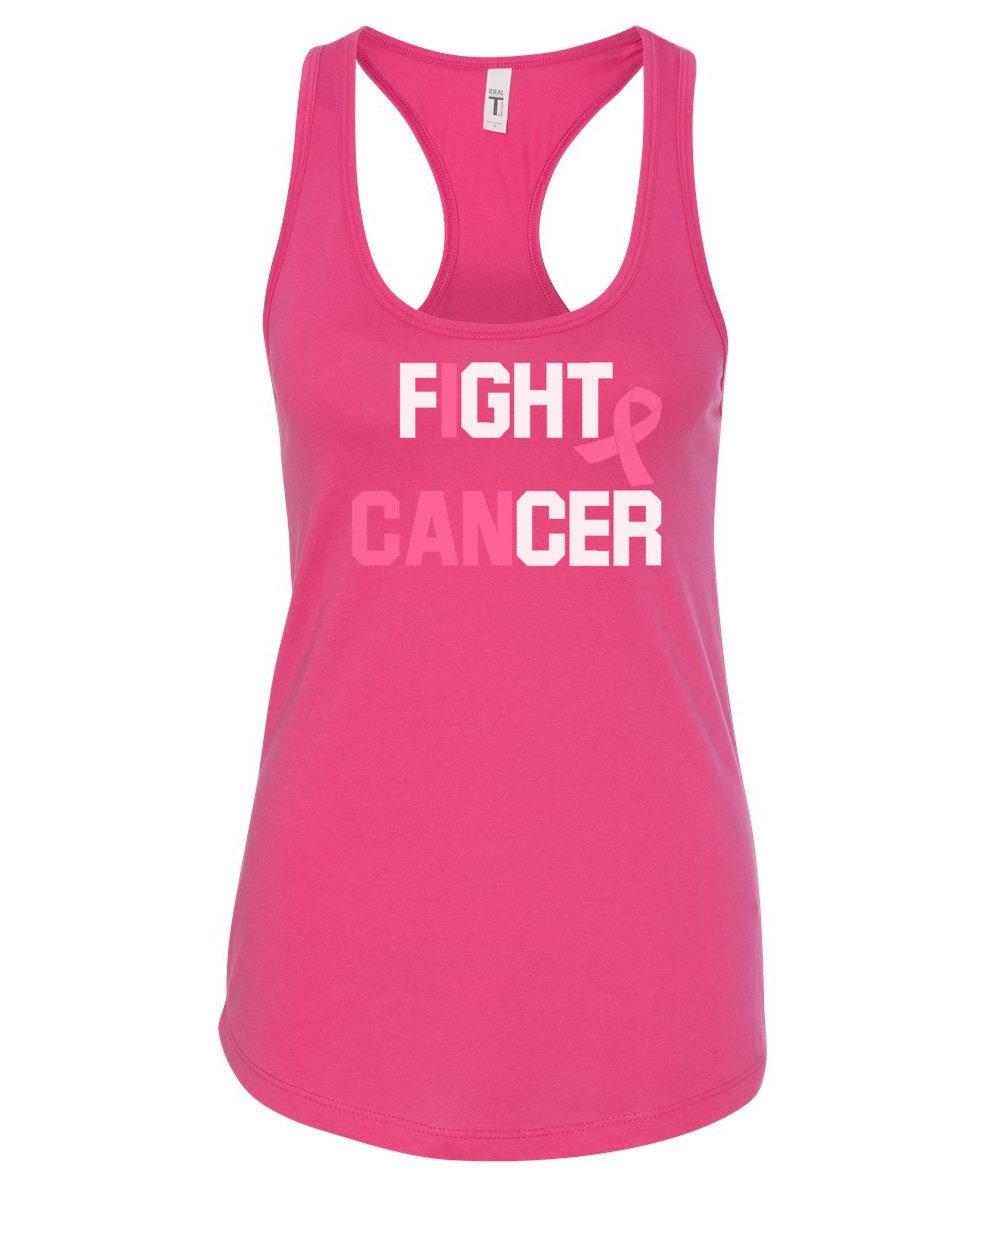 Survivor Pink Ribbon Women/'s Racerback Breast Cancer Awareness Shirt